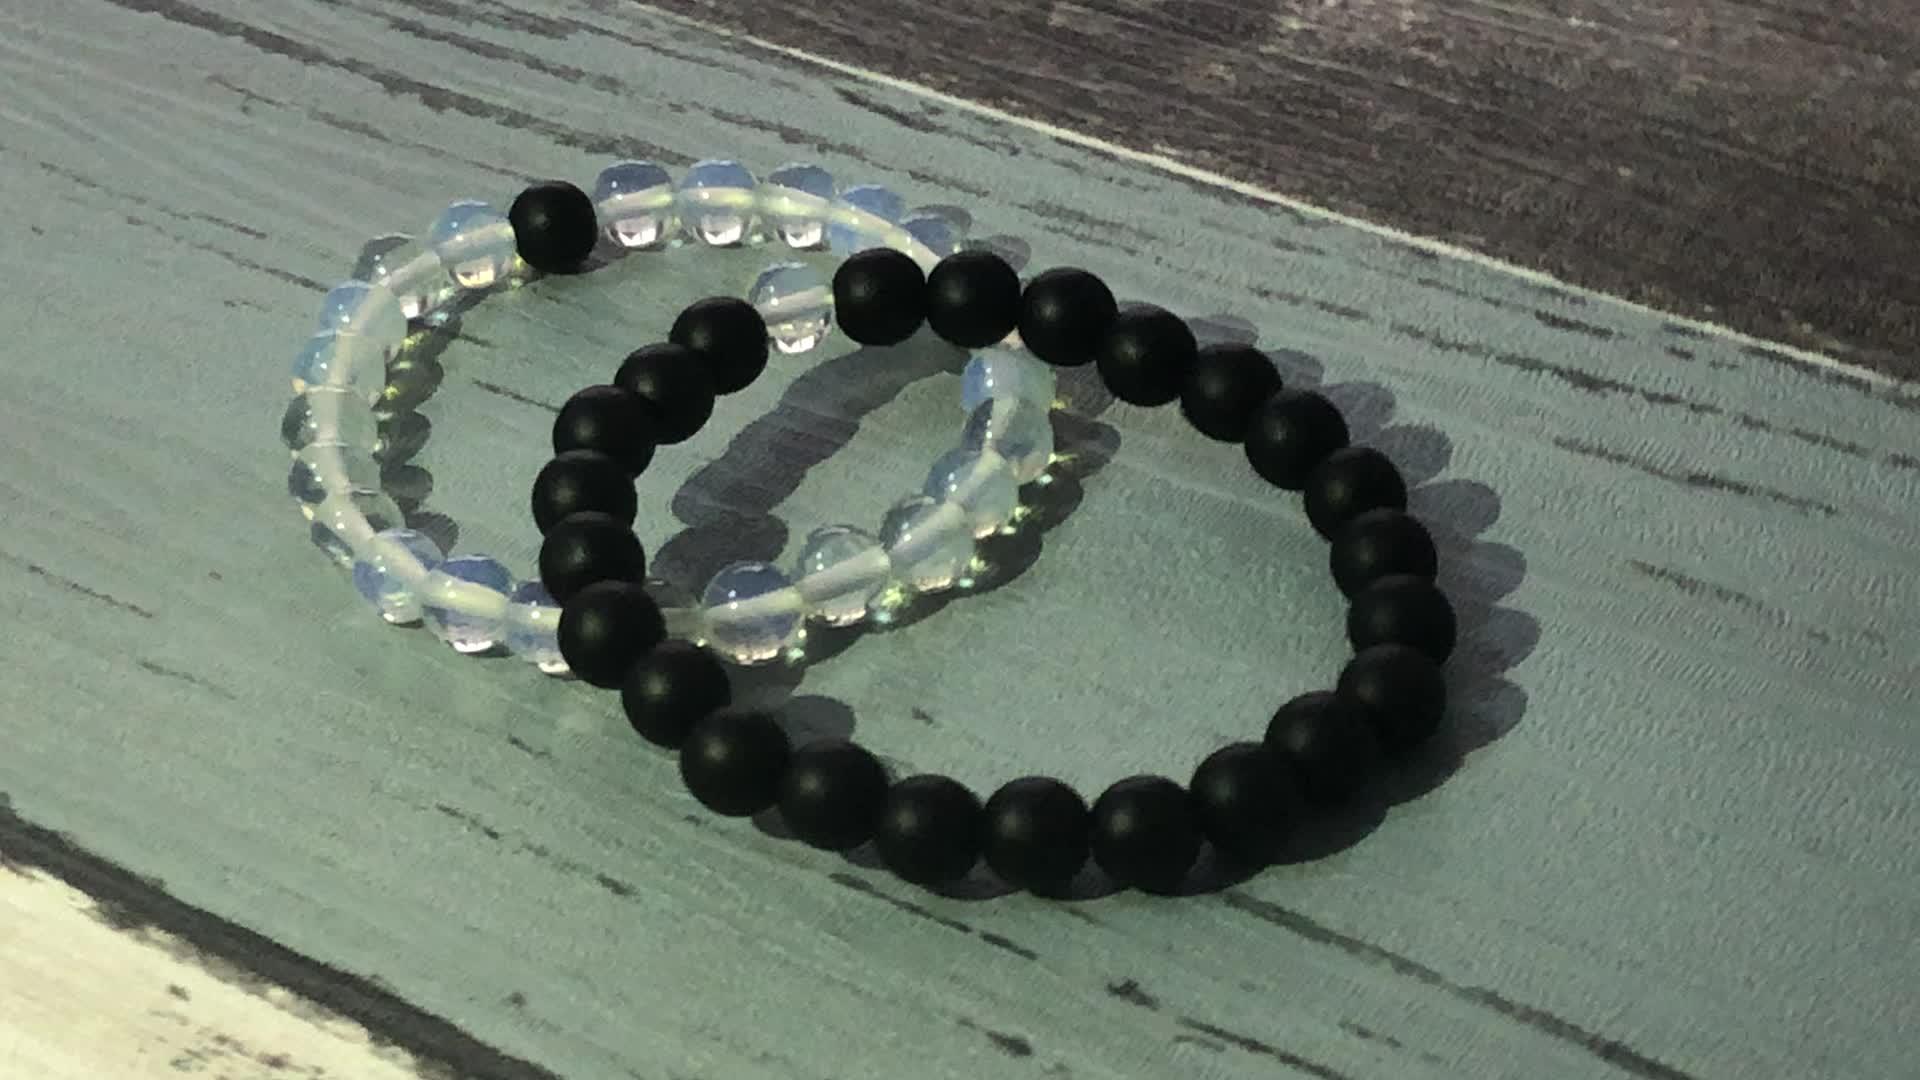 SN1646 Friendship Rough Stone Bracelets Healing Lava Stone Beaded Bracelet Raw Quartz Crystal Charm Bracelet